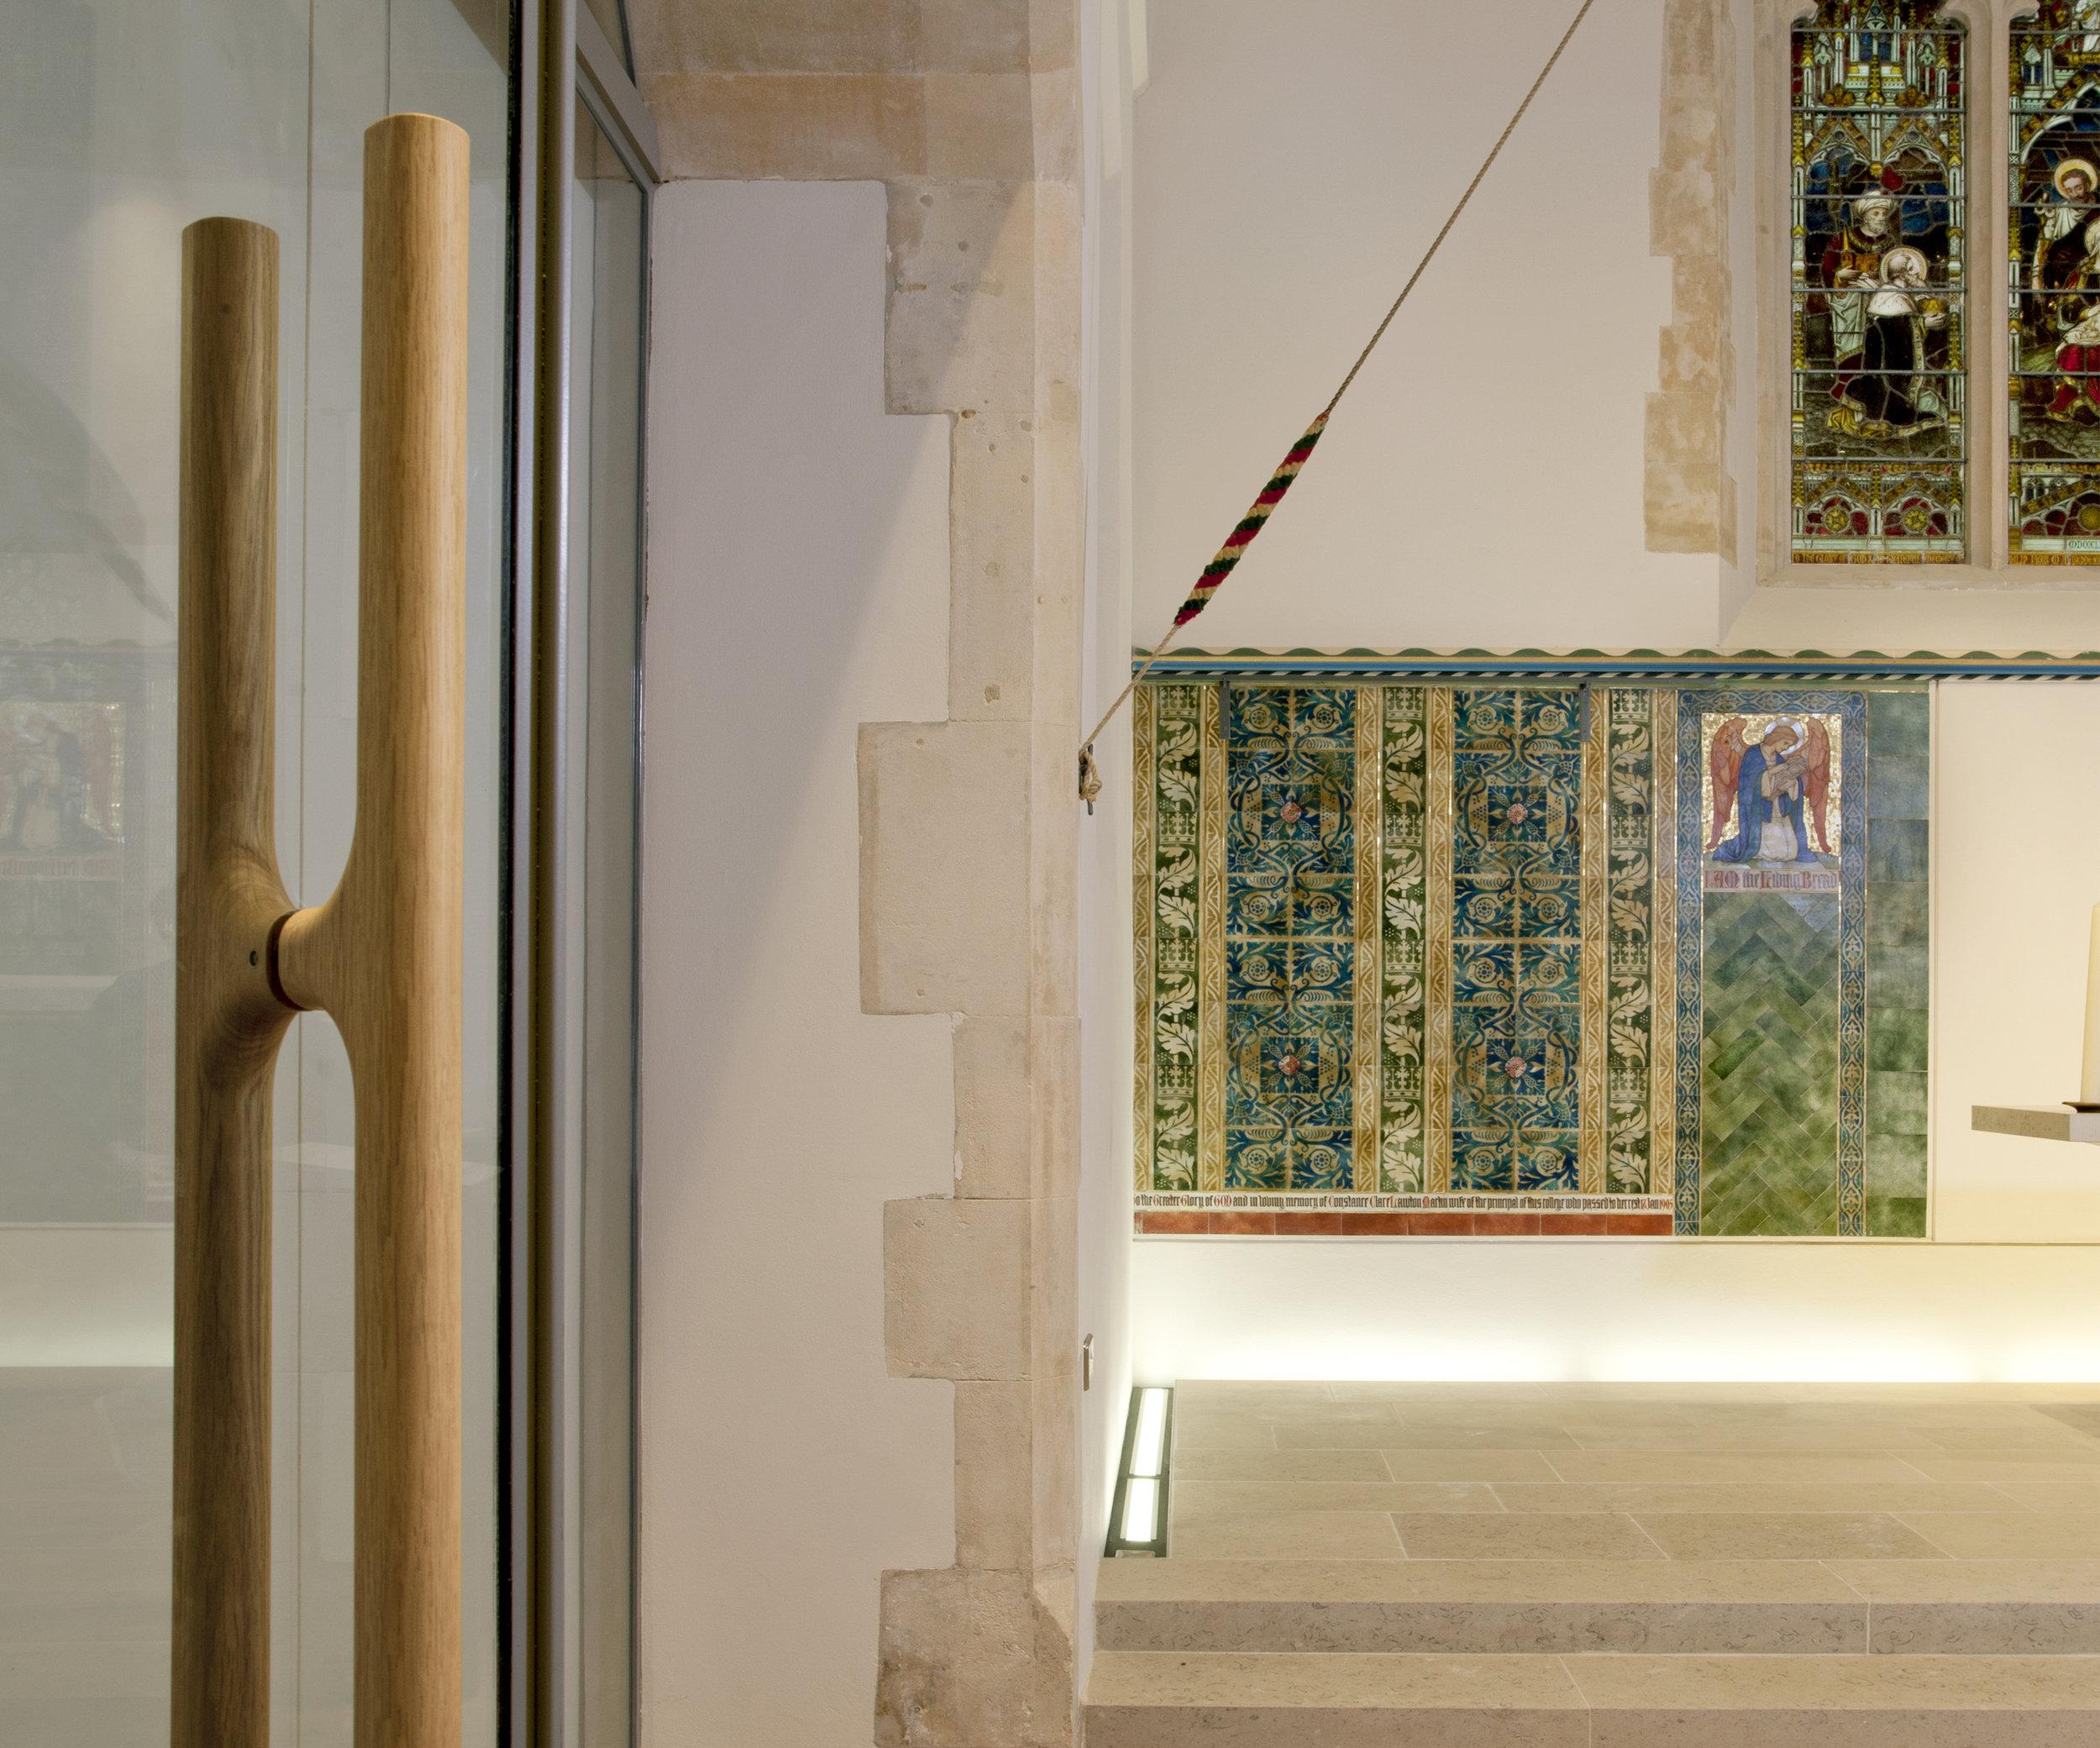 Mowat and Company Share Wooden Door Handles at Winton Chapel